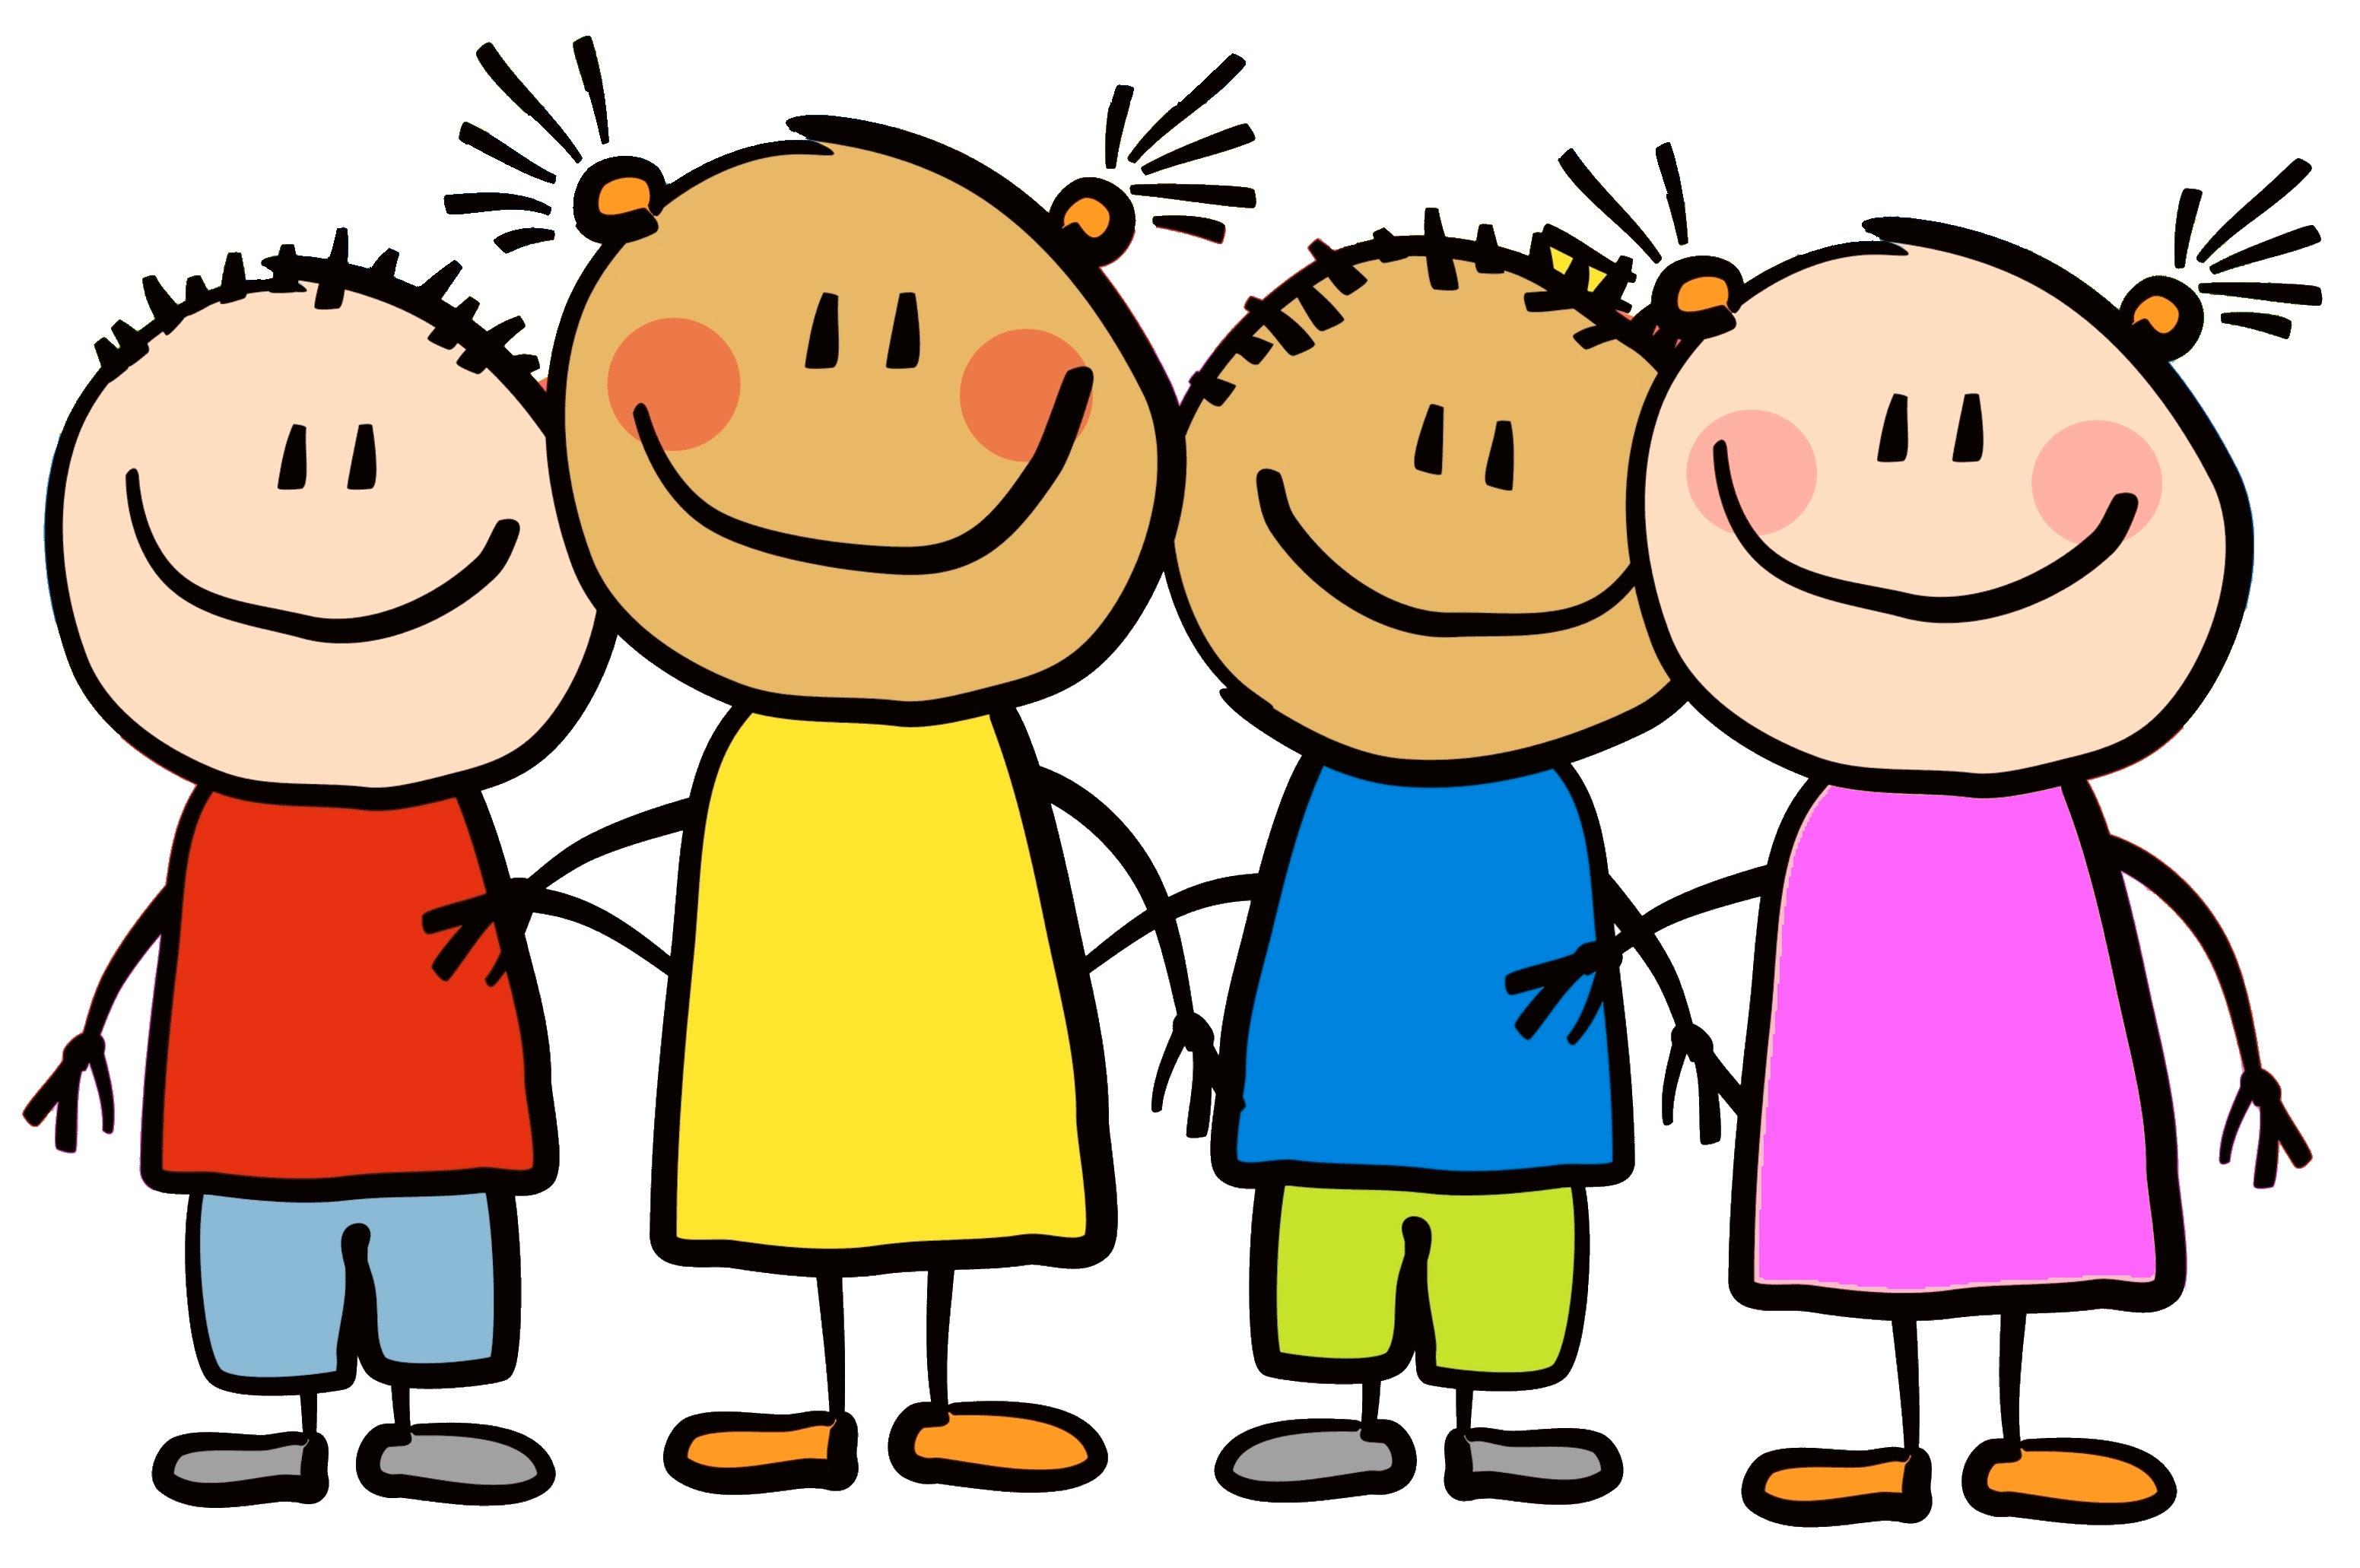 cartoon-little-kids-happy-clipart-7 | Elkhorn Public Schools Foundation